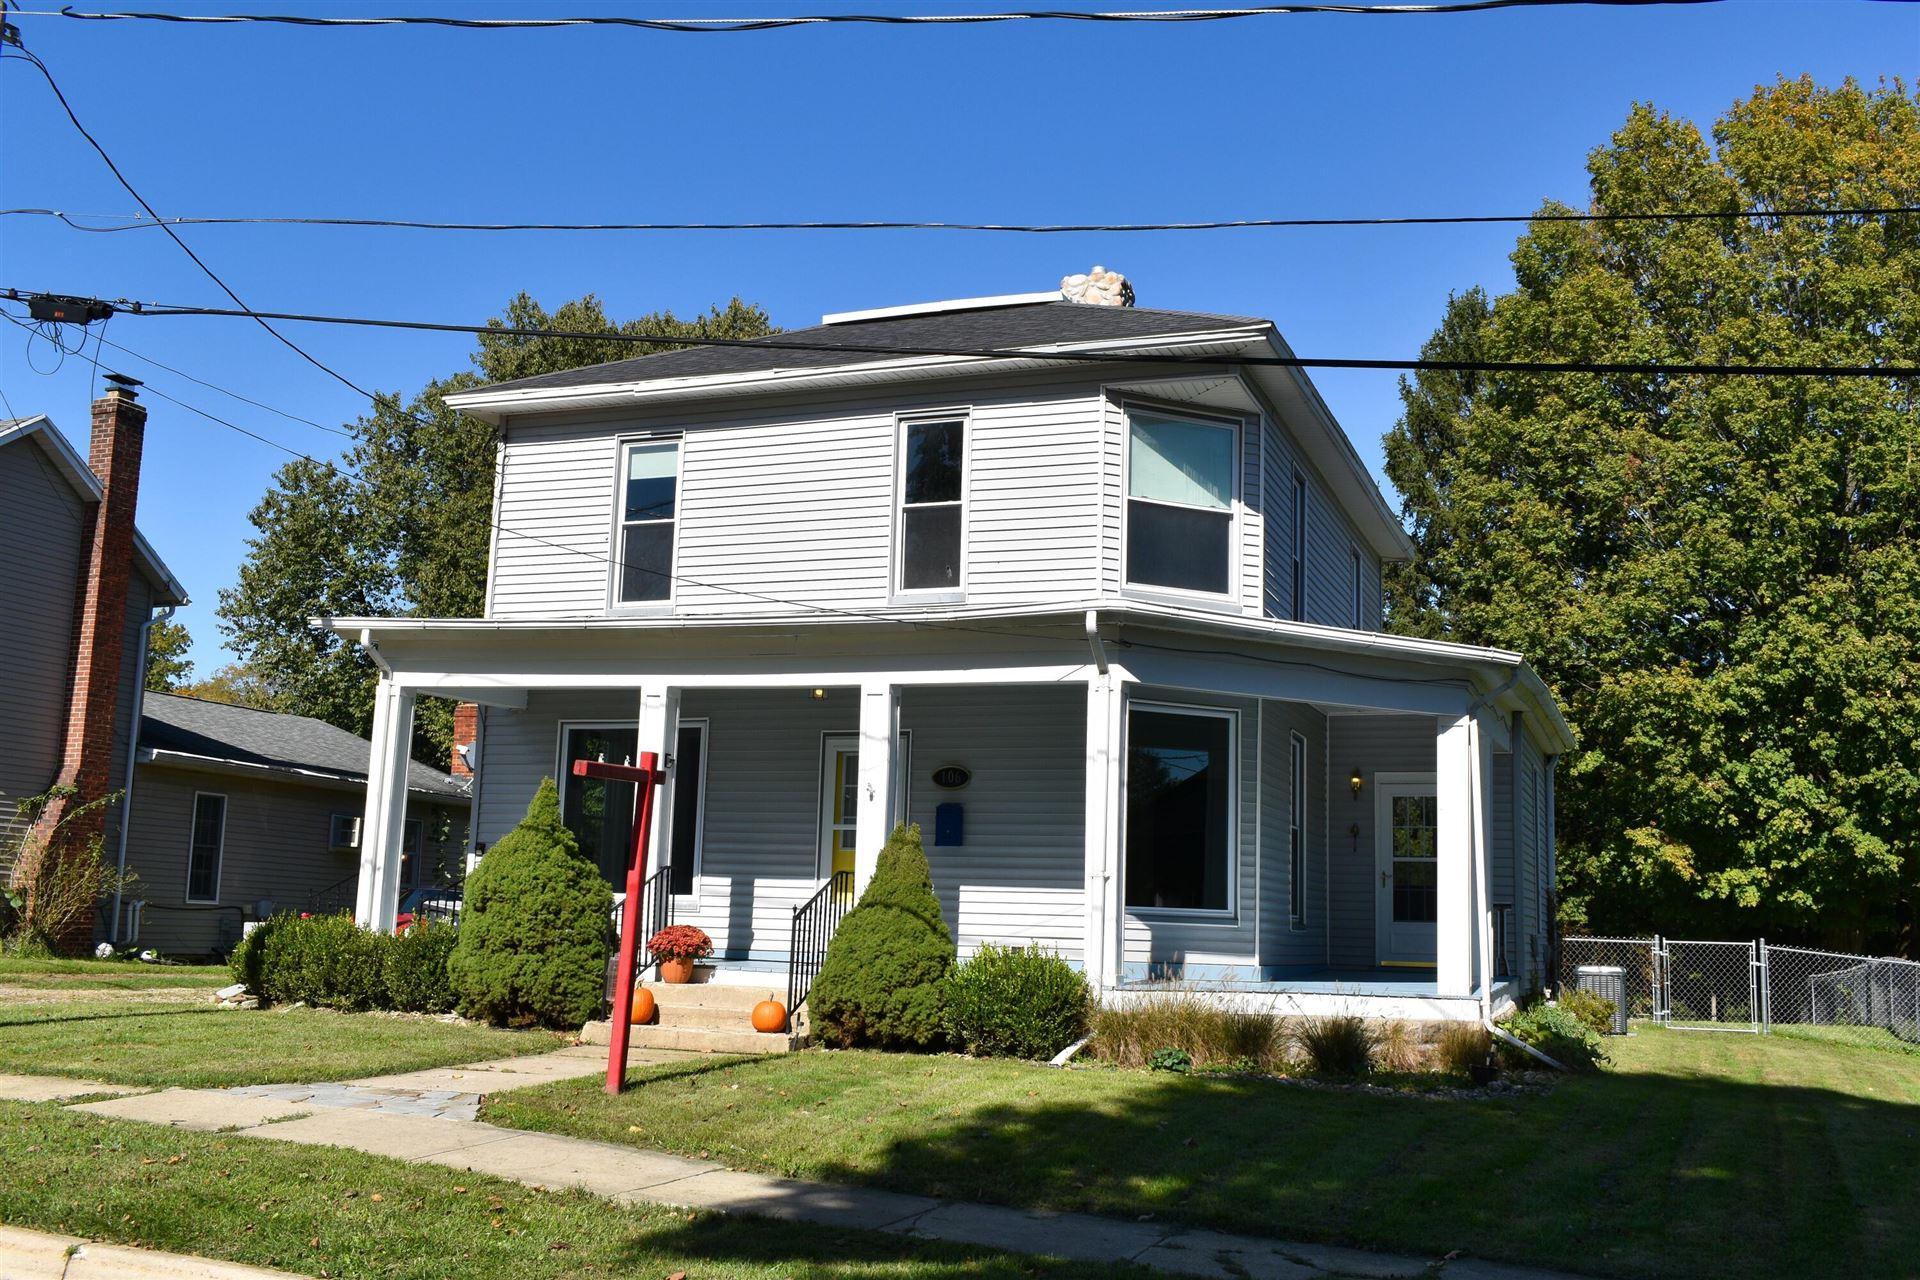 106 W 3rd Street, Buchanan, MI 49107 - MLS#: 21111286